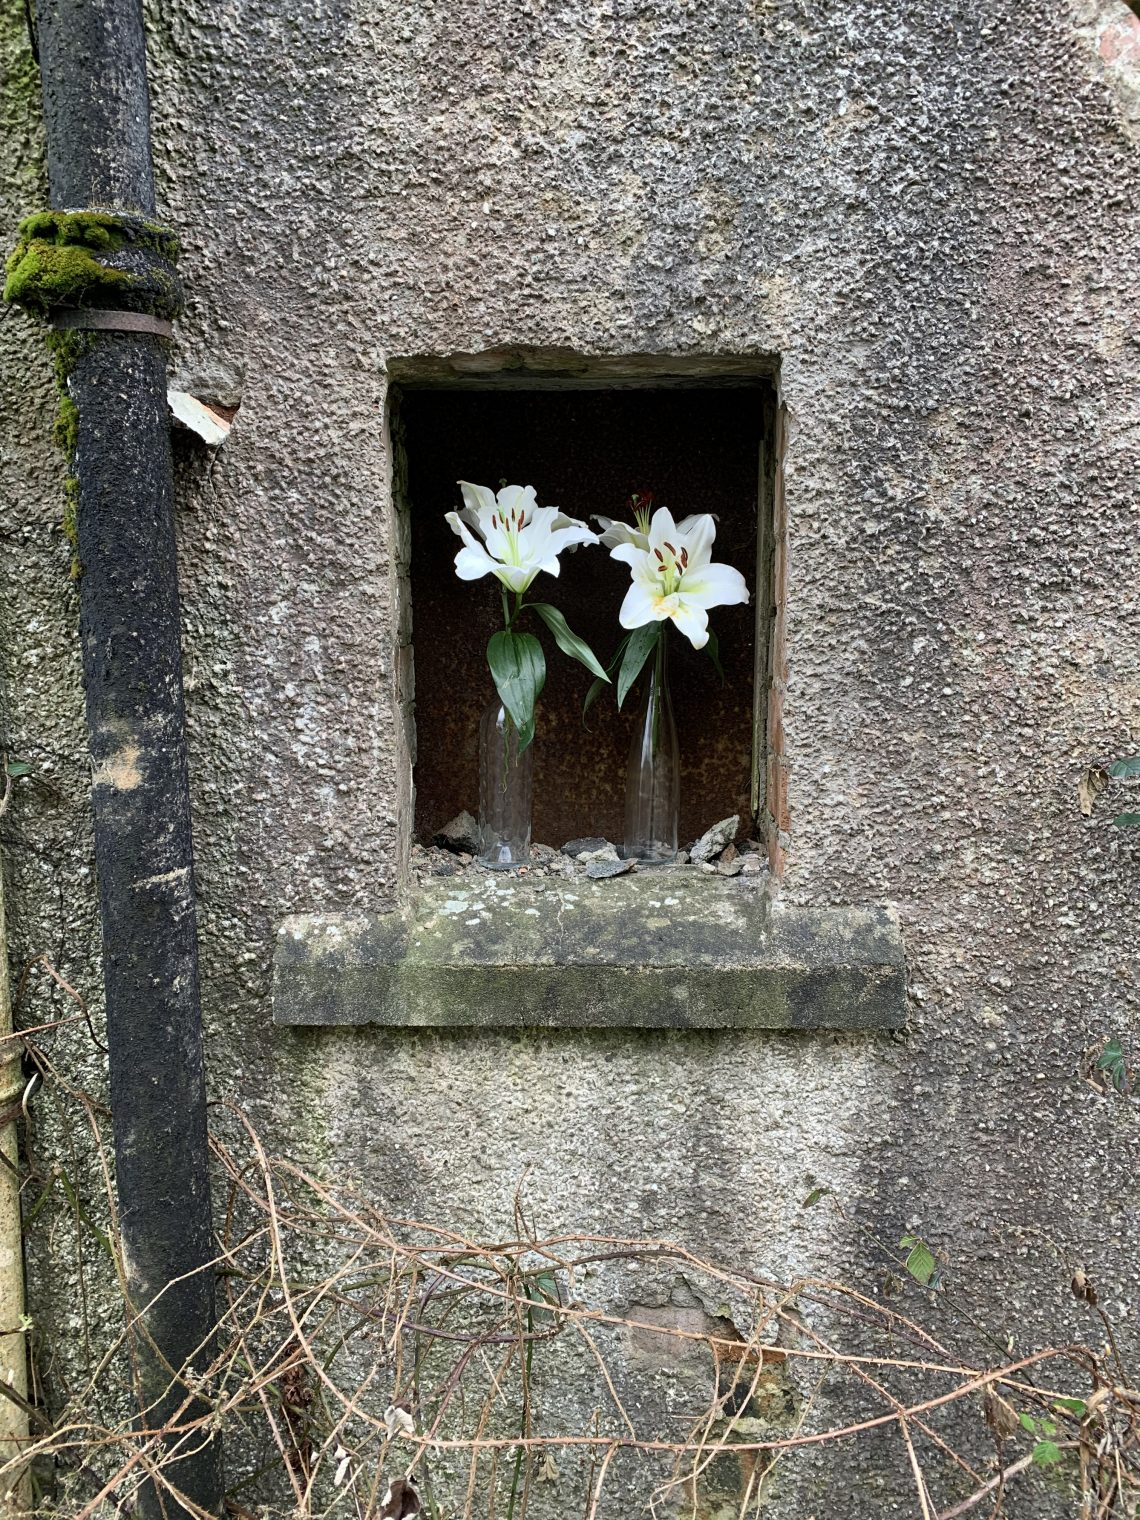 Tannery Hoose Windae #5: Easter Lilies